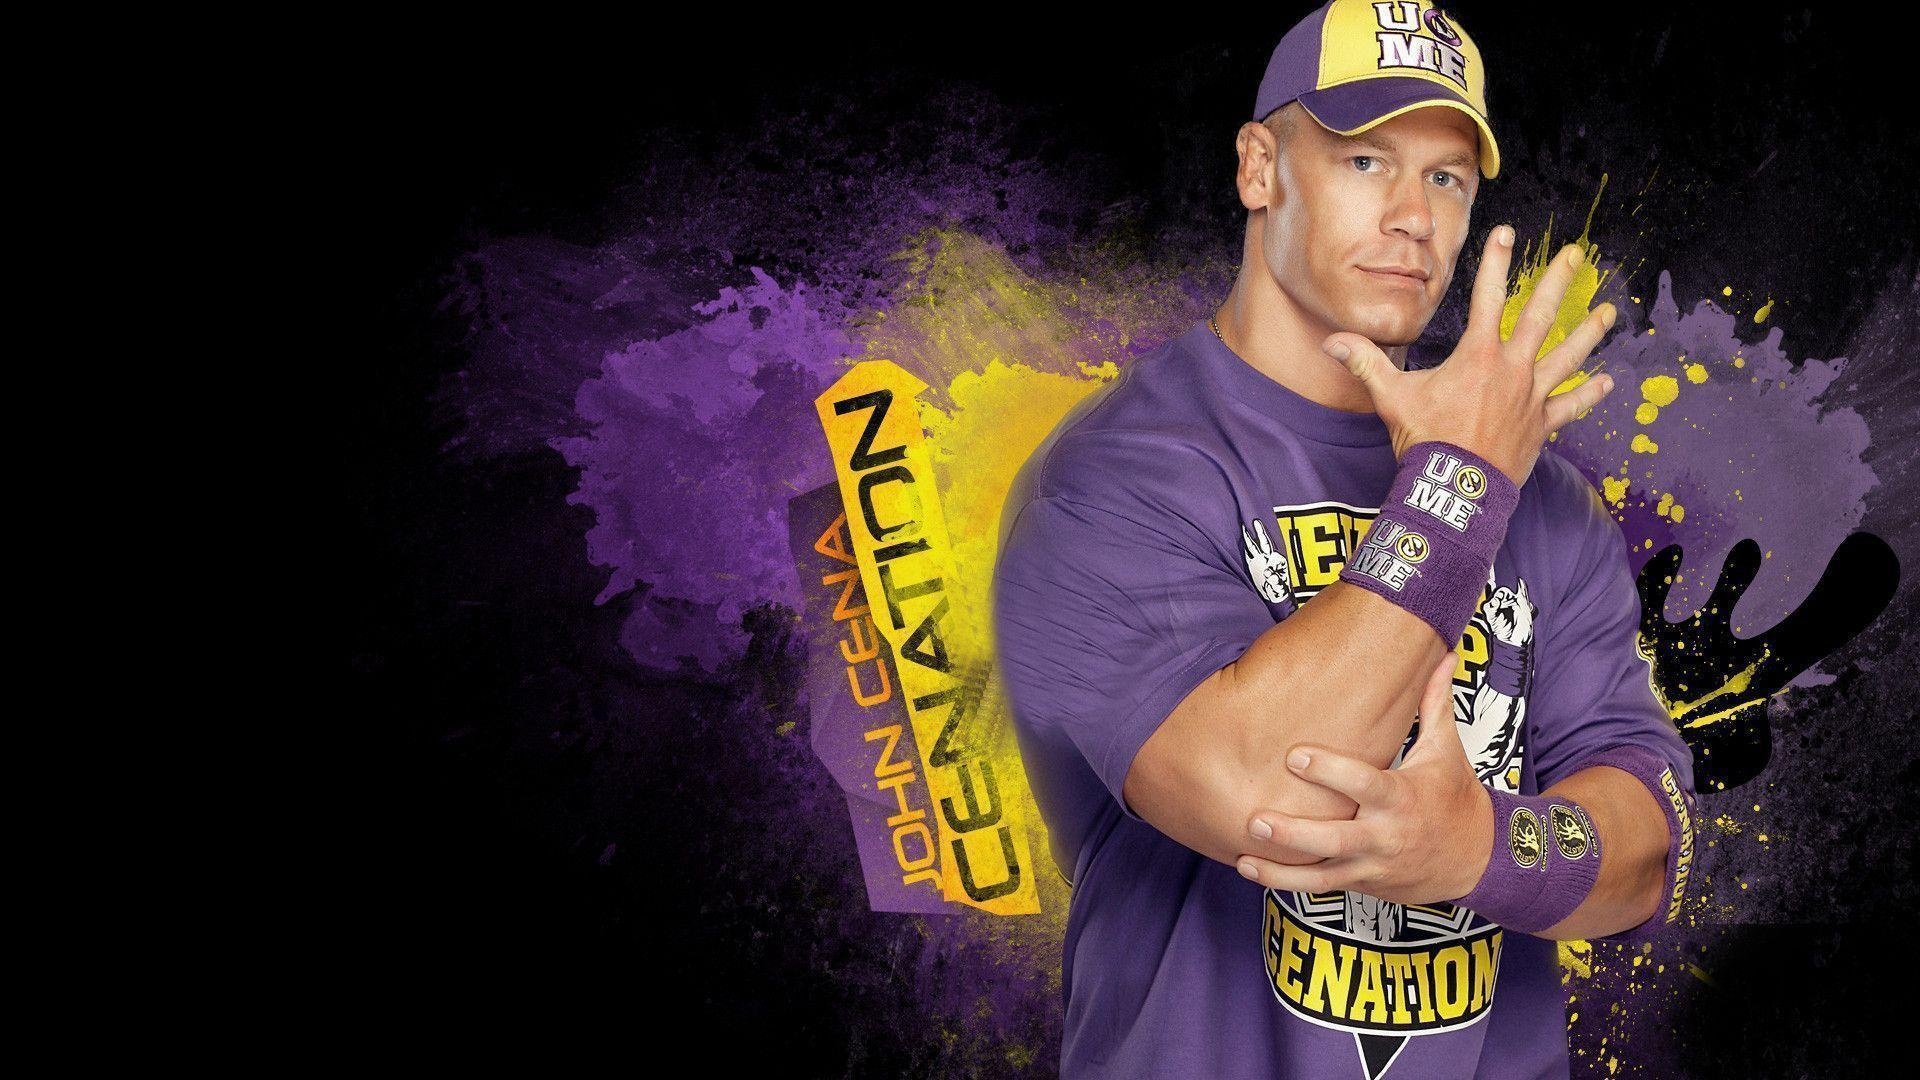 John Cena Purple Wallpaper Desktop #4174 Wallpaper | Wallpaper ...